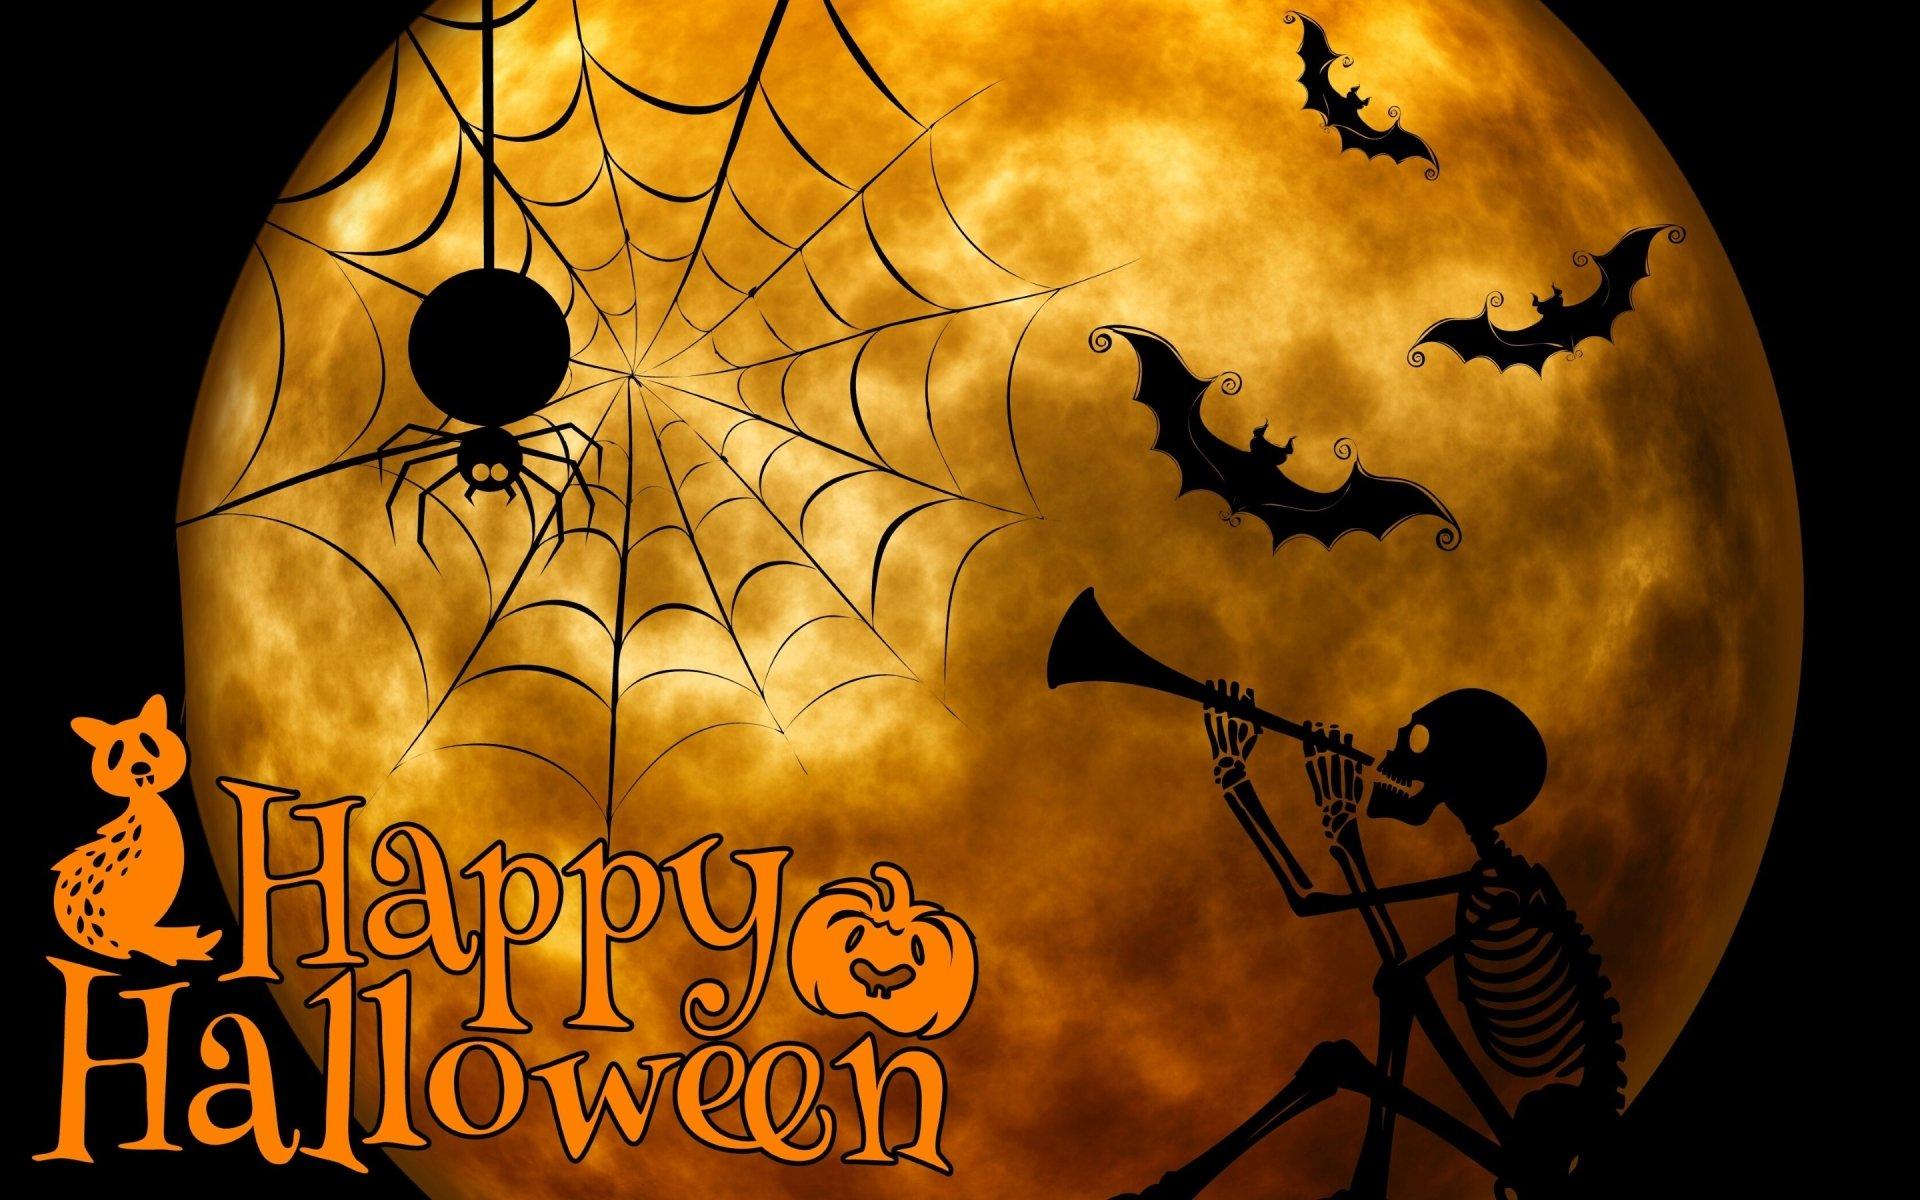 Holiday - Halloween  Spider Skeleton Bat Wallpaper